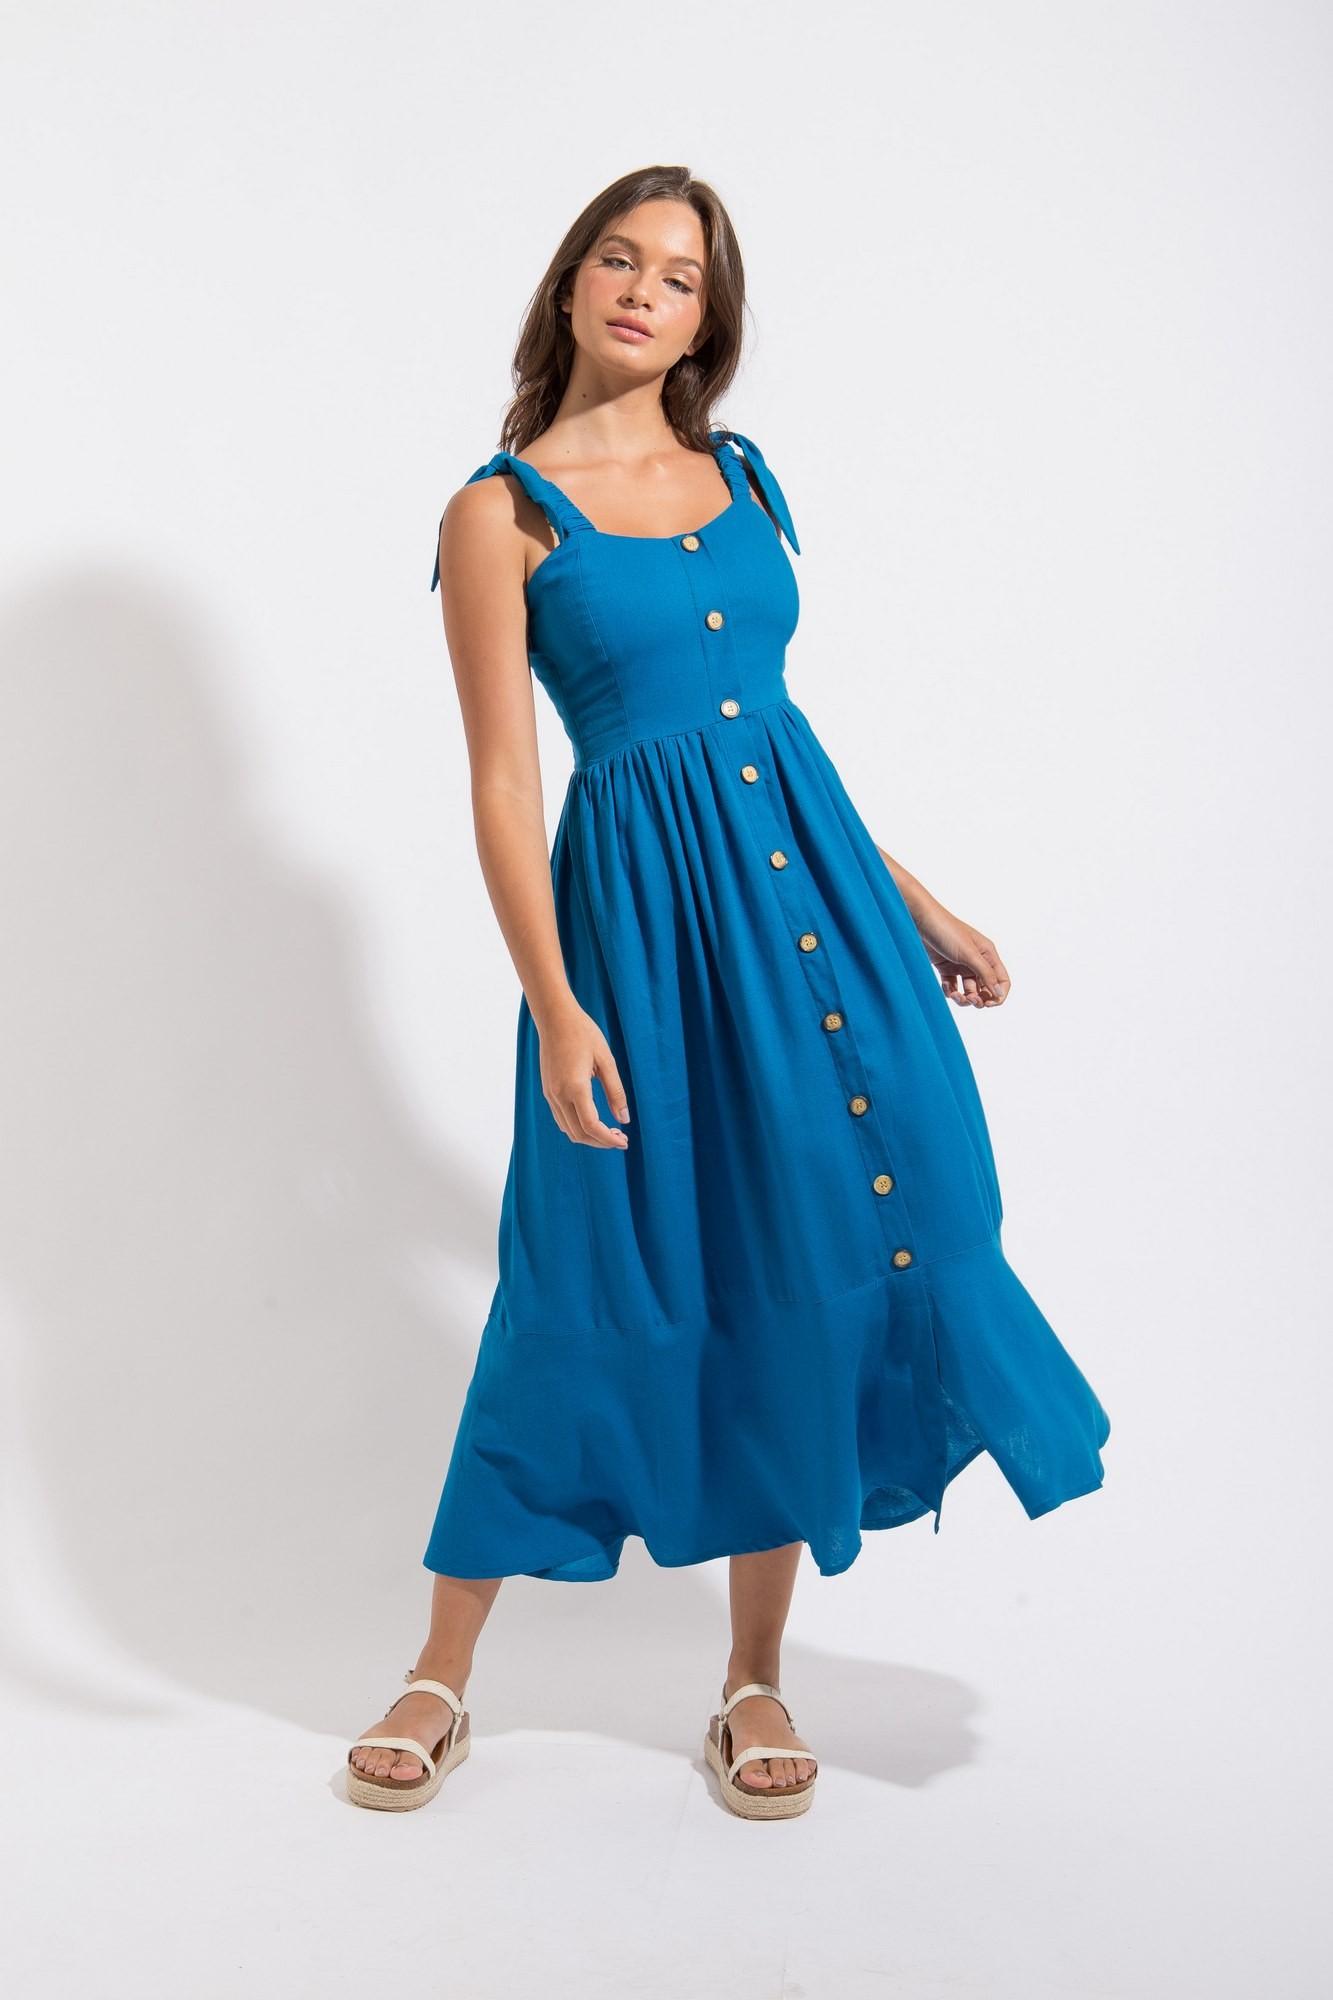 Vestido Midi Linho Nó  Azul